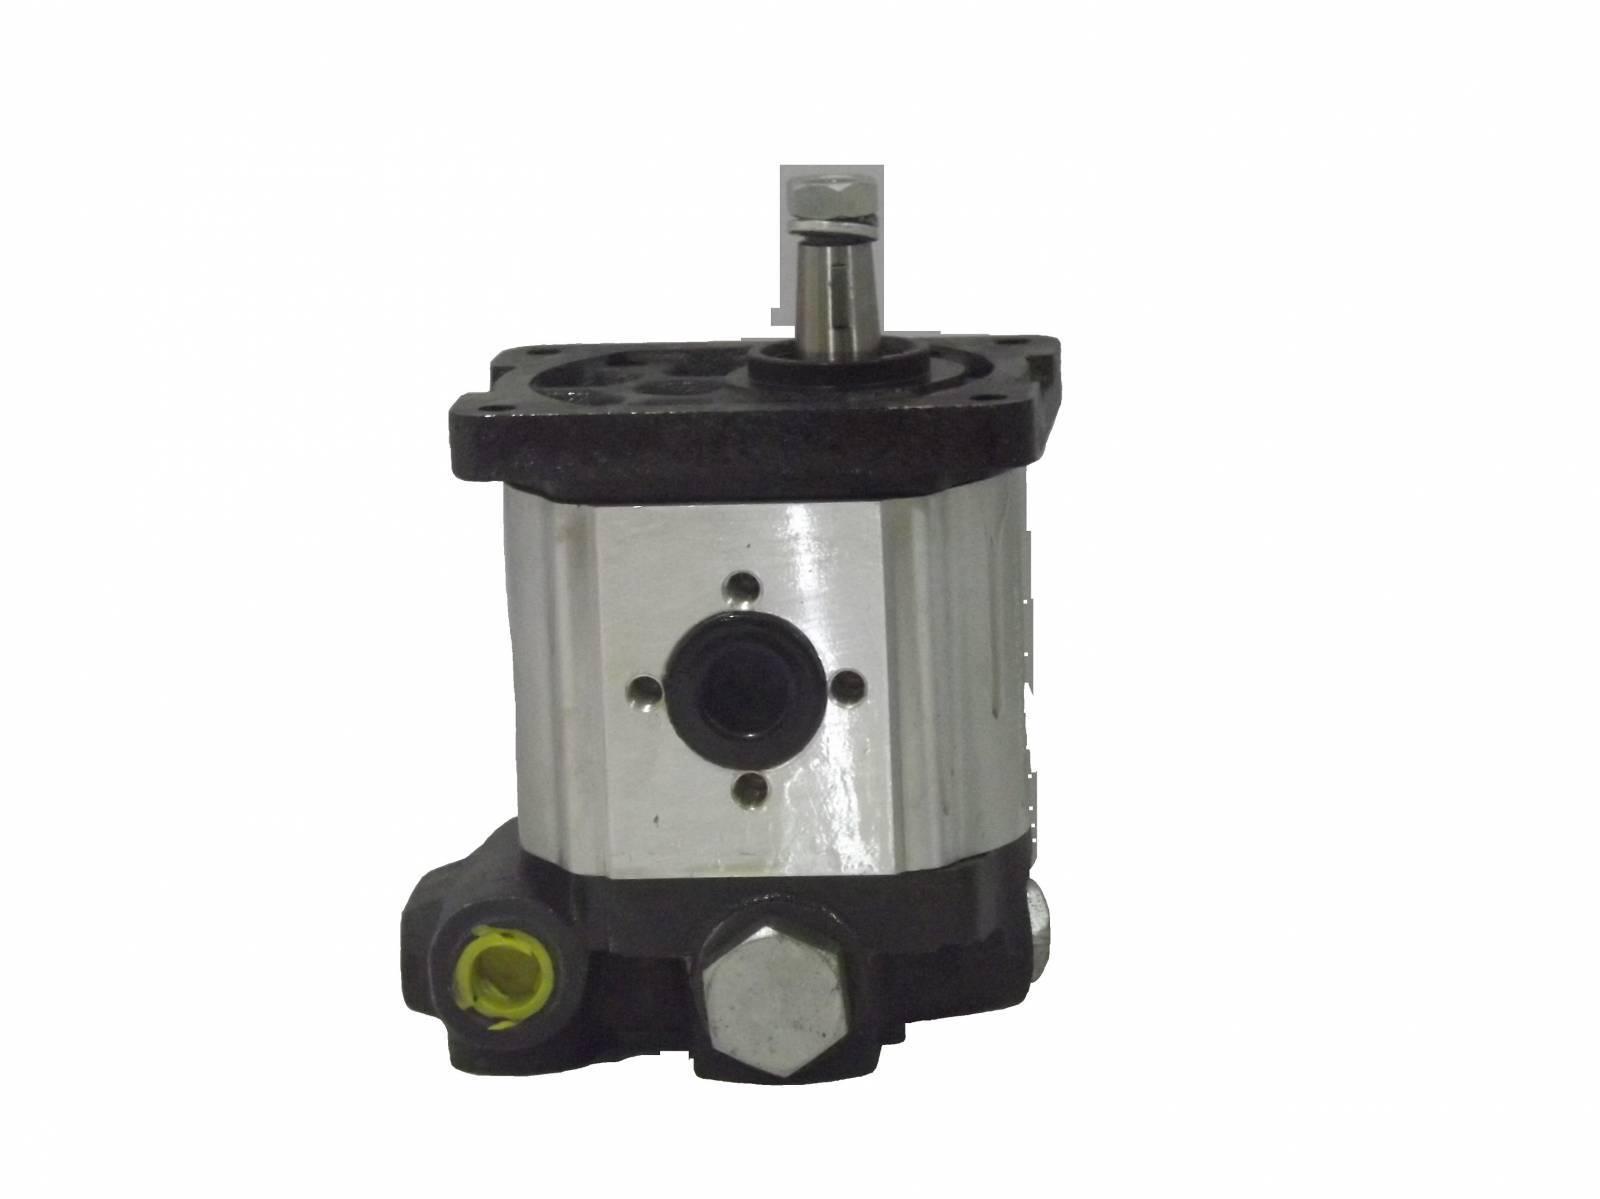 BOMBA HIDR TRATOR TL 110 -120 -130 - 140 -TM 110 -120 -130 -140 -150